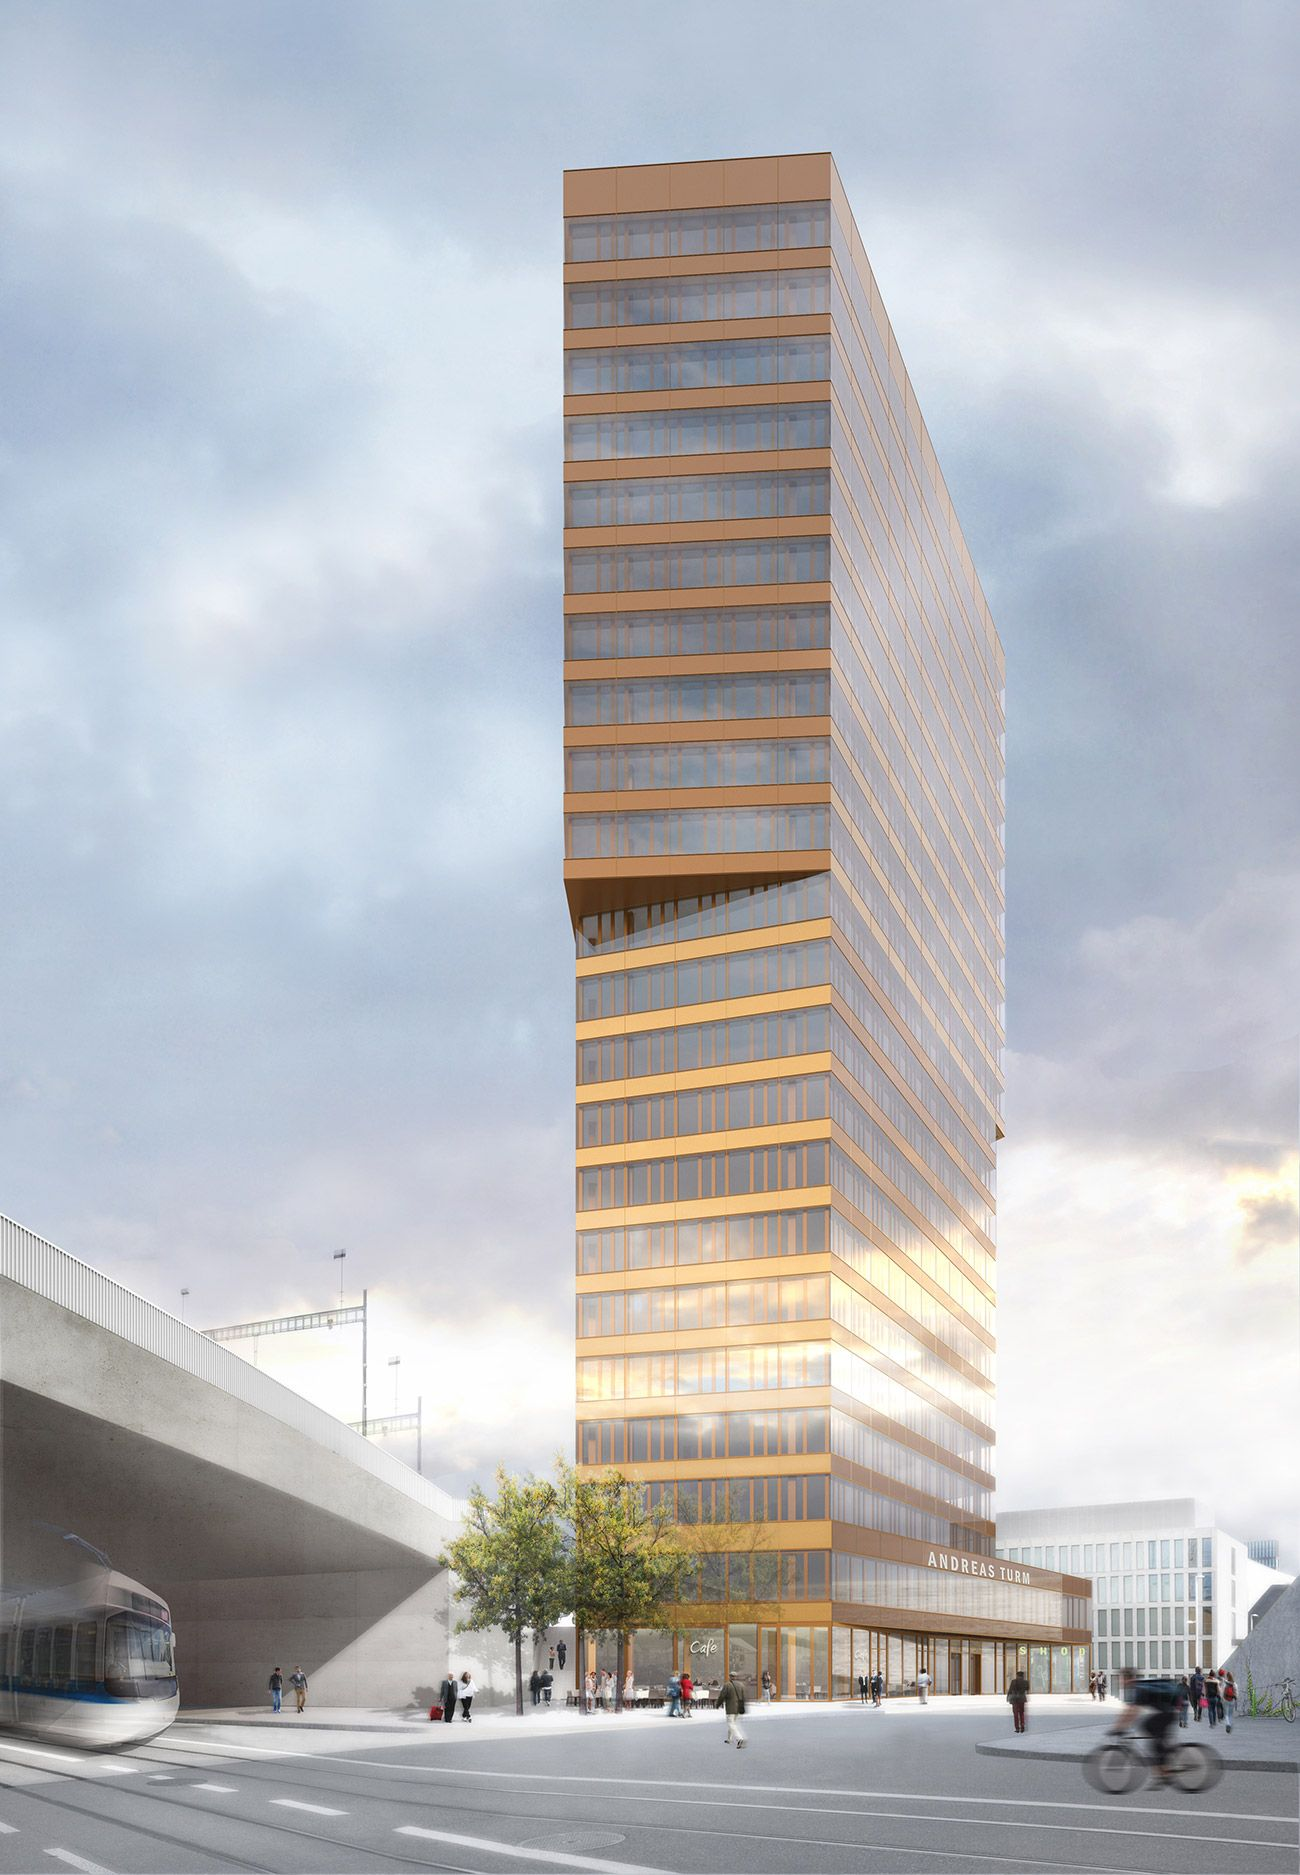 Office High-rise Andreasturm